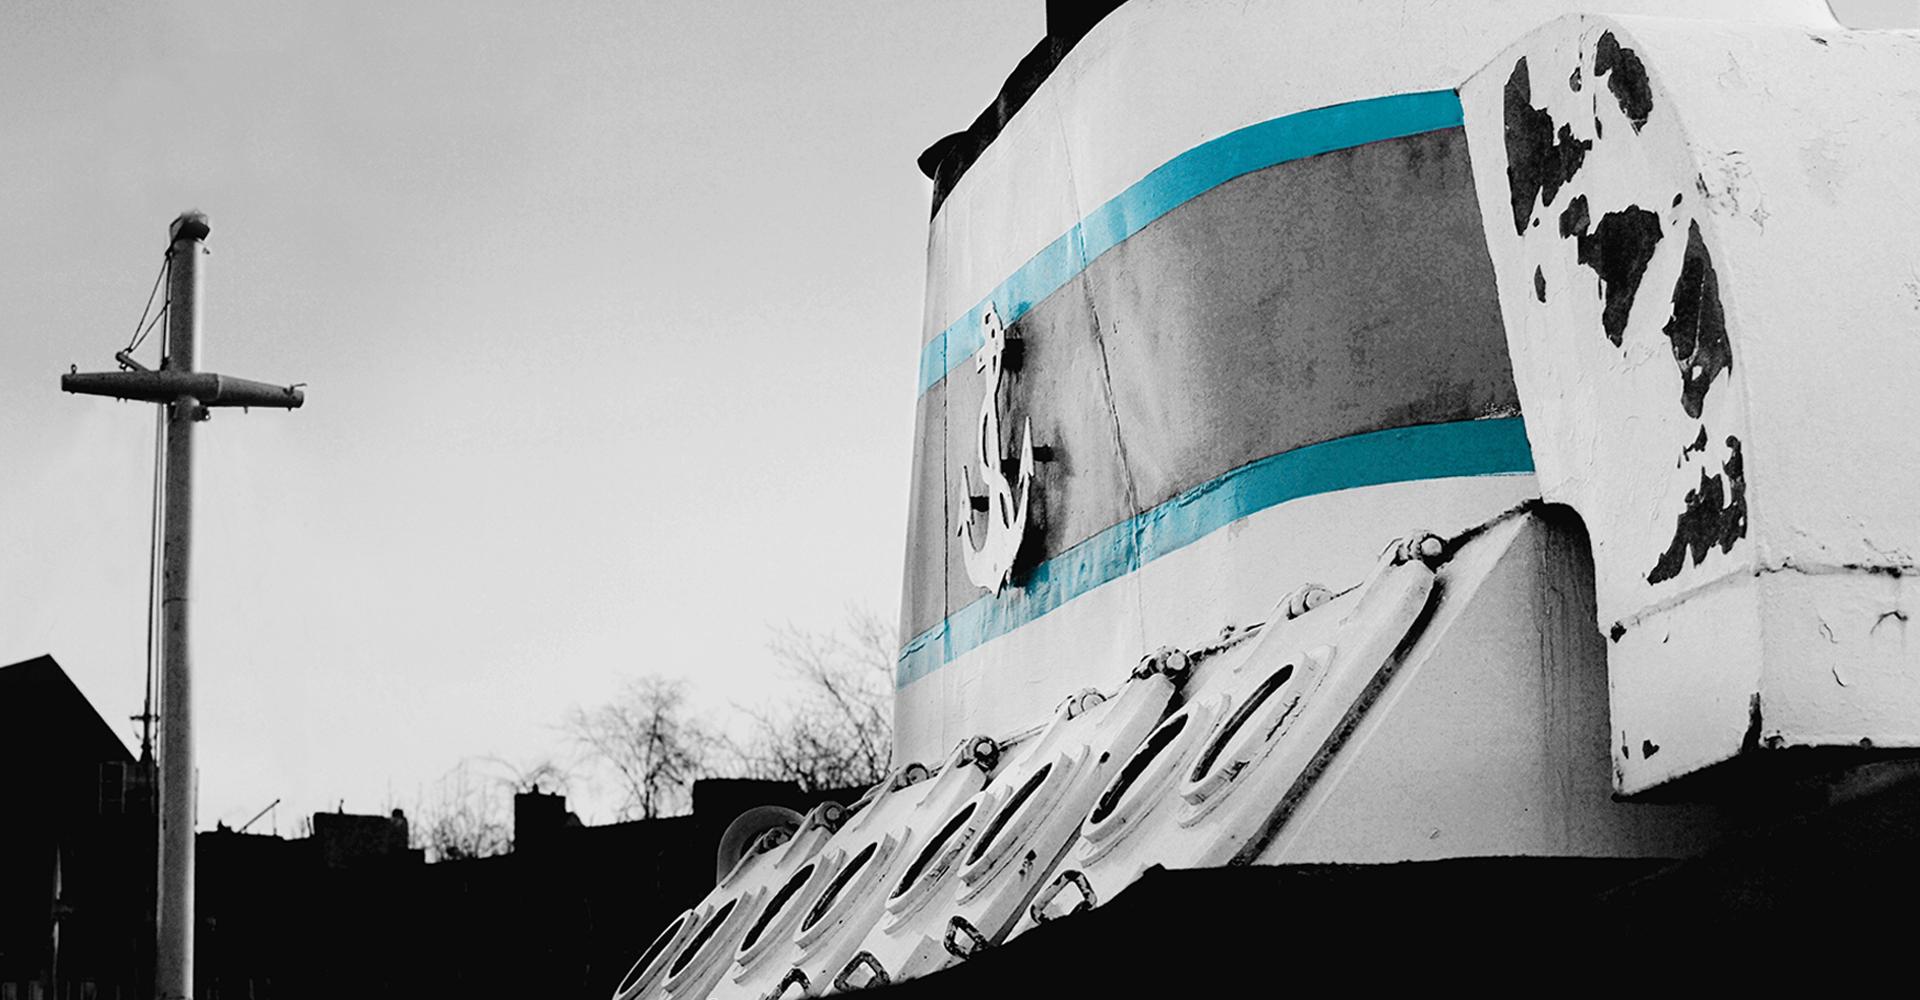 Segelschule_Headerbild_1920x1000